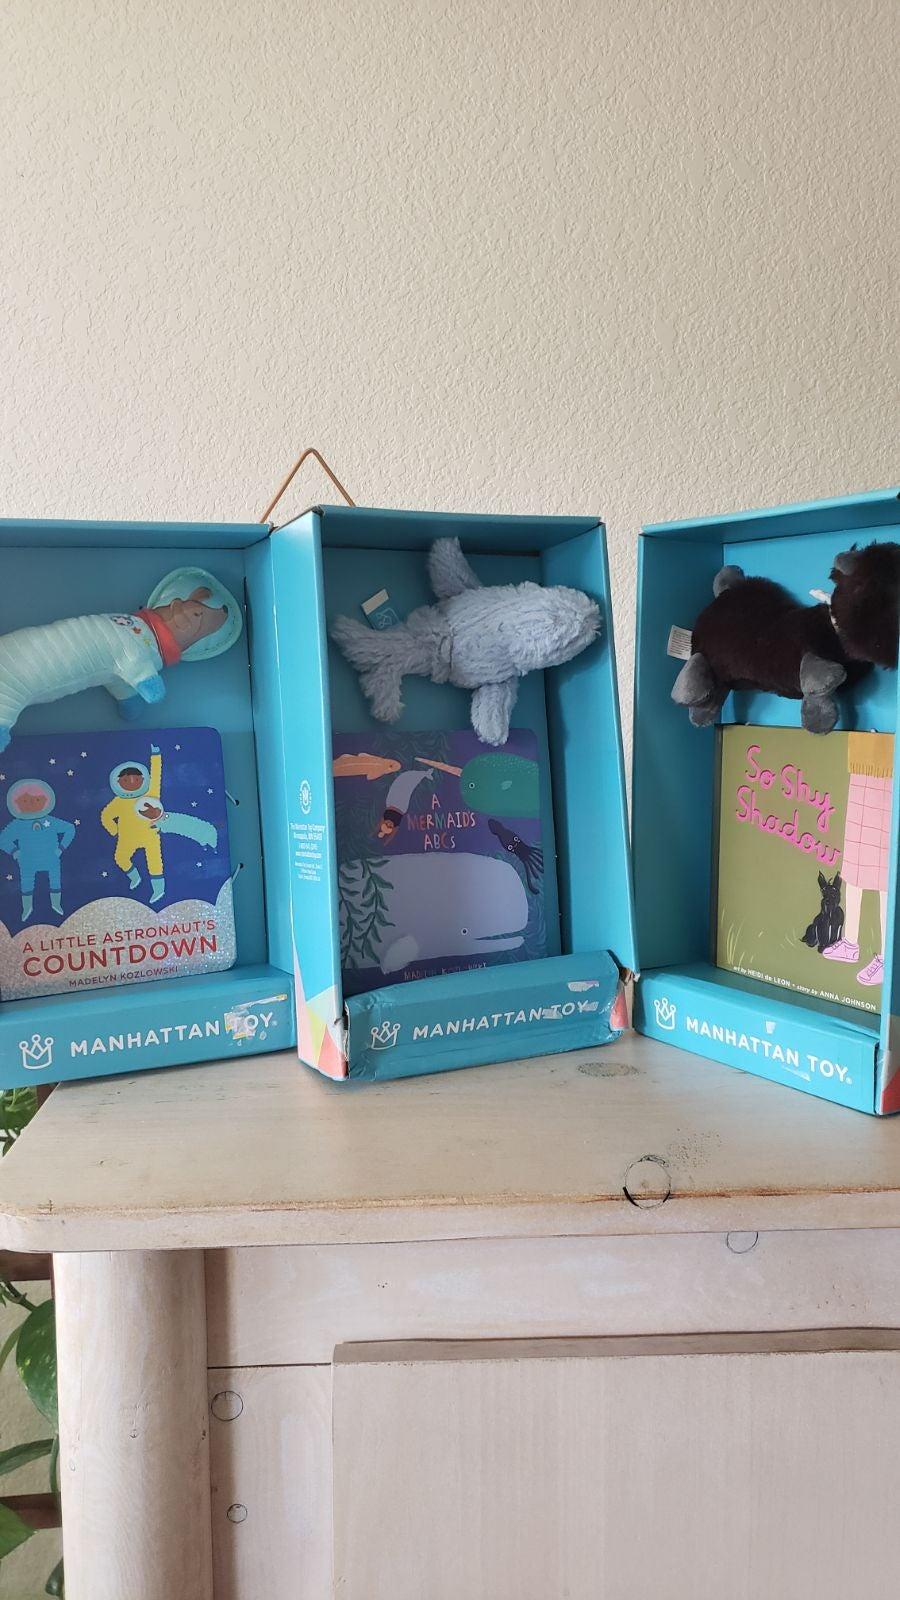 Manhattan Book Lot Mermaid Astronaut Dog